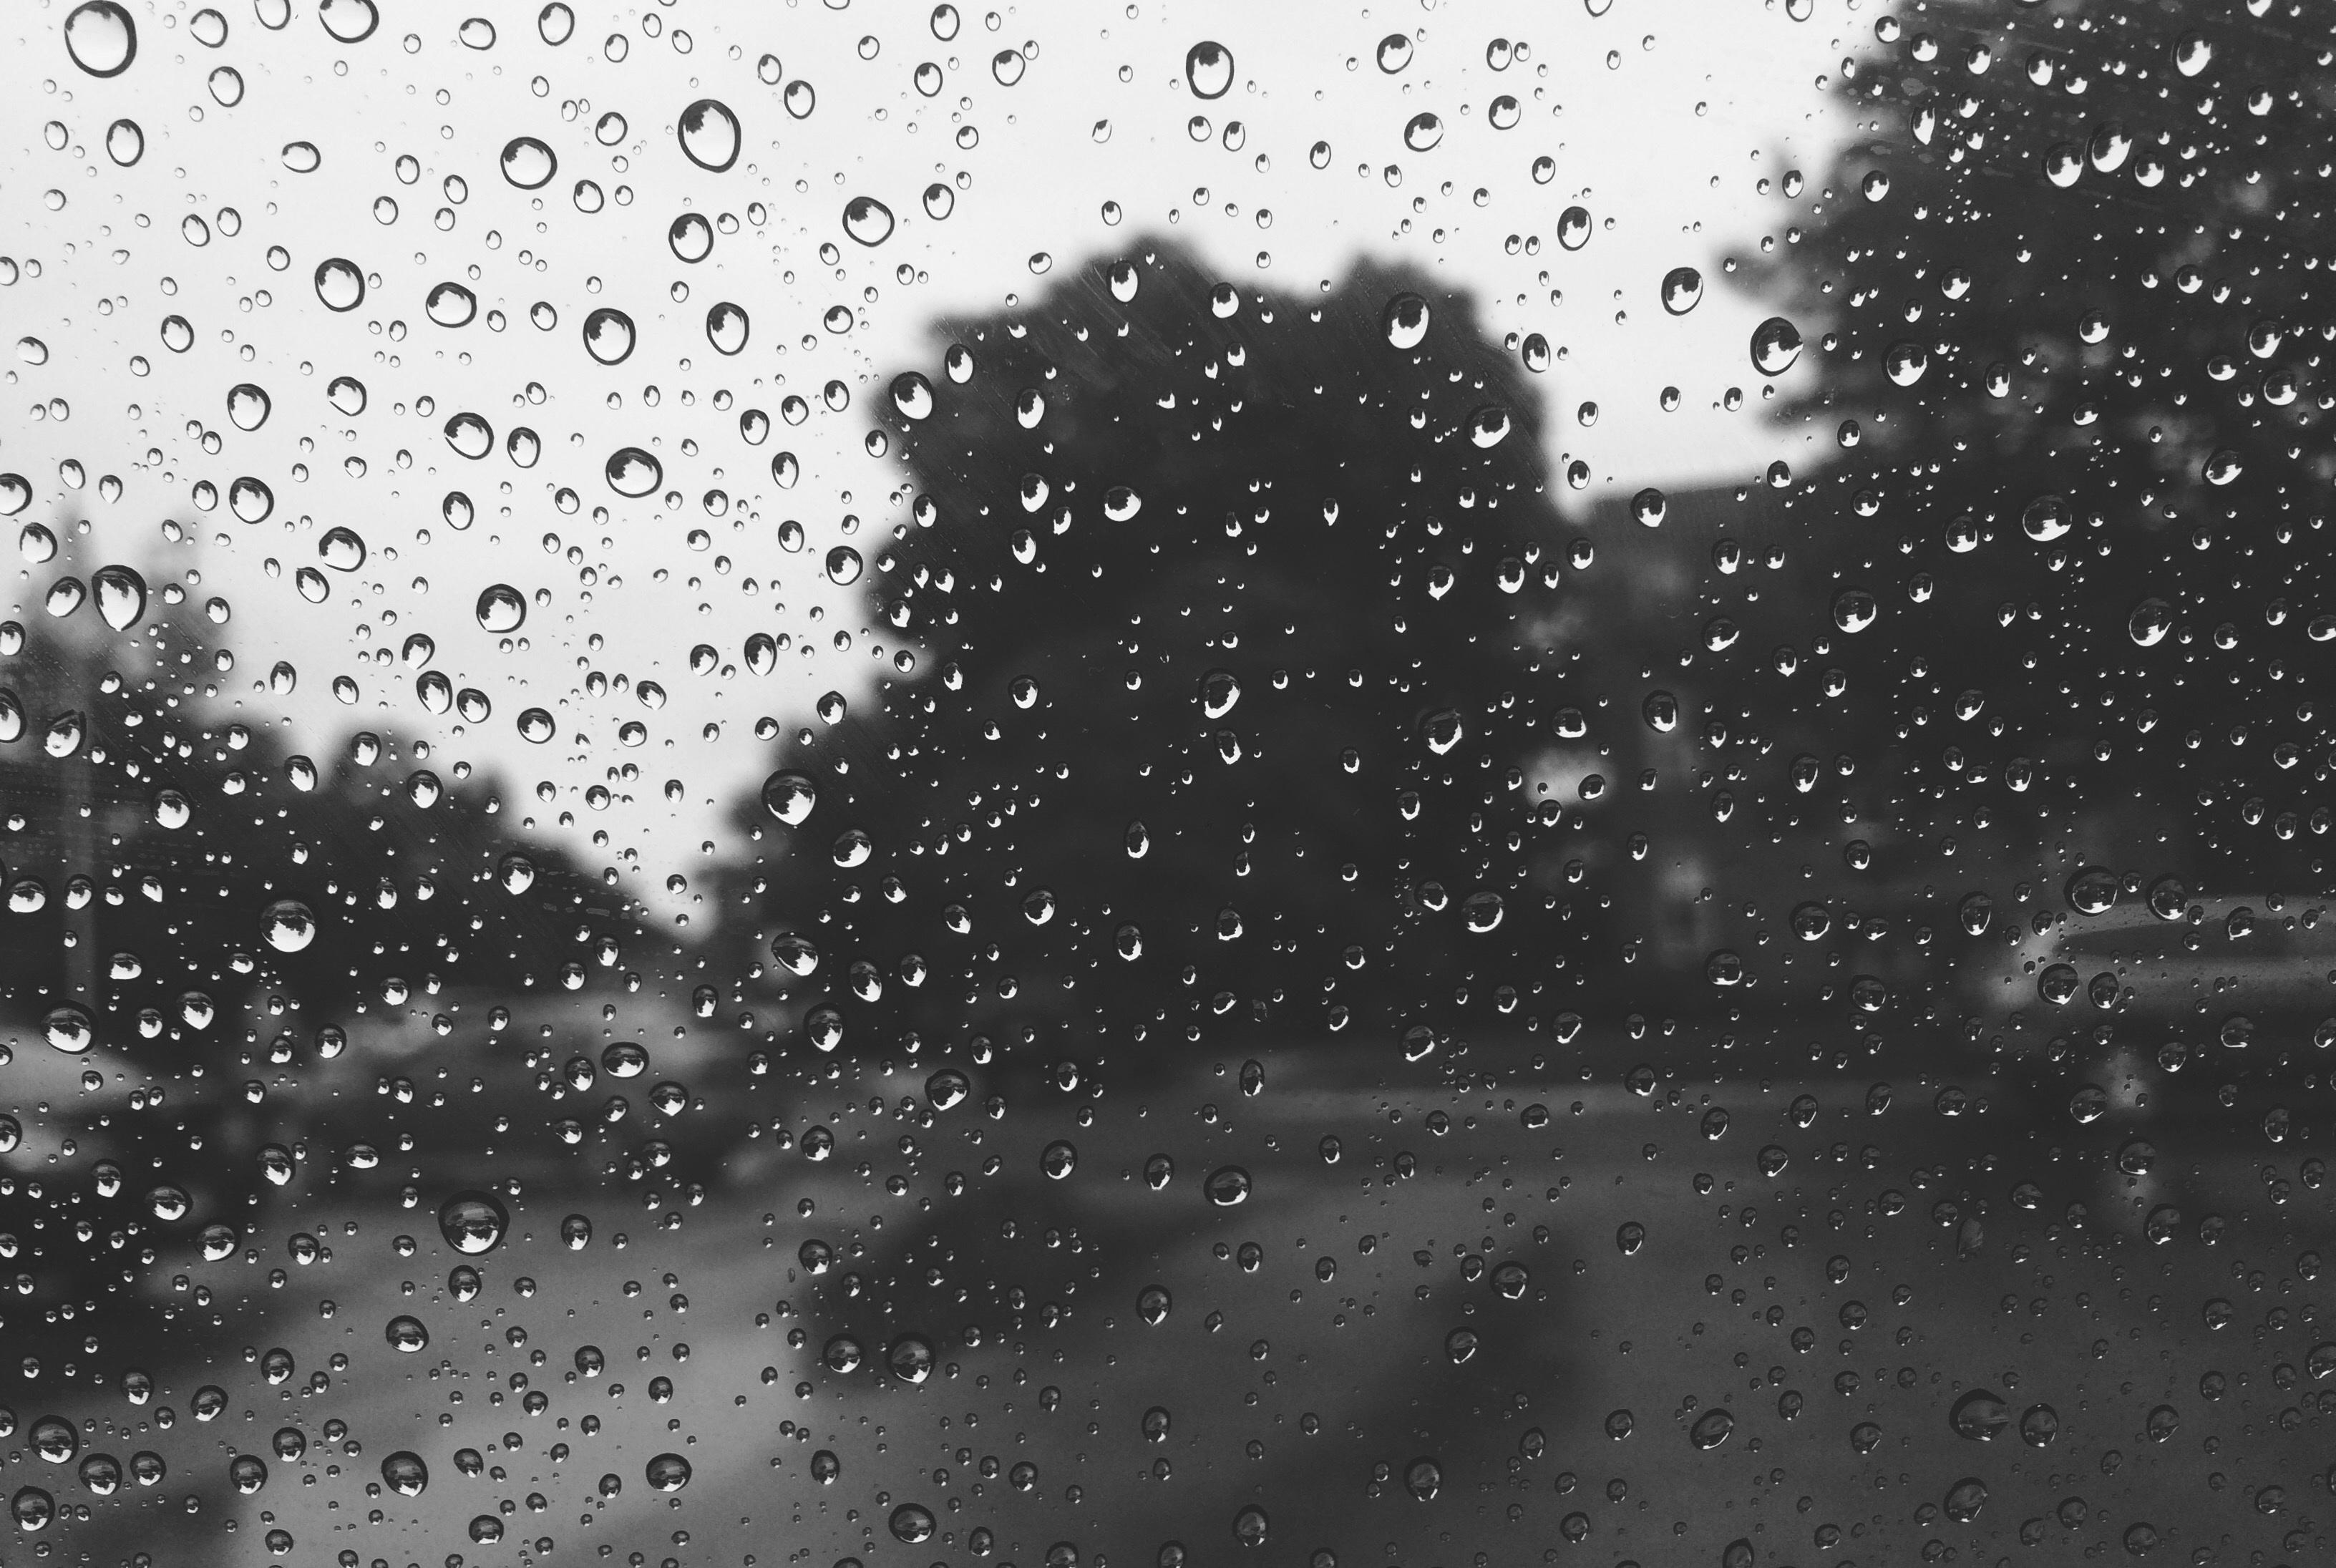 Rainy Day Black & White Photography | Abduzeedo Design ... |Rain Photography Black And White